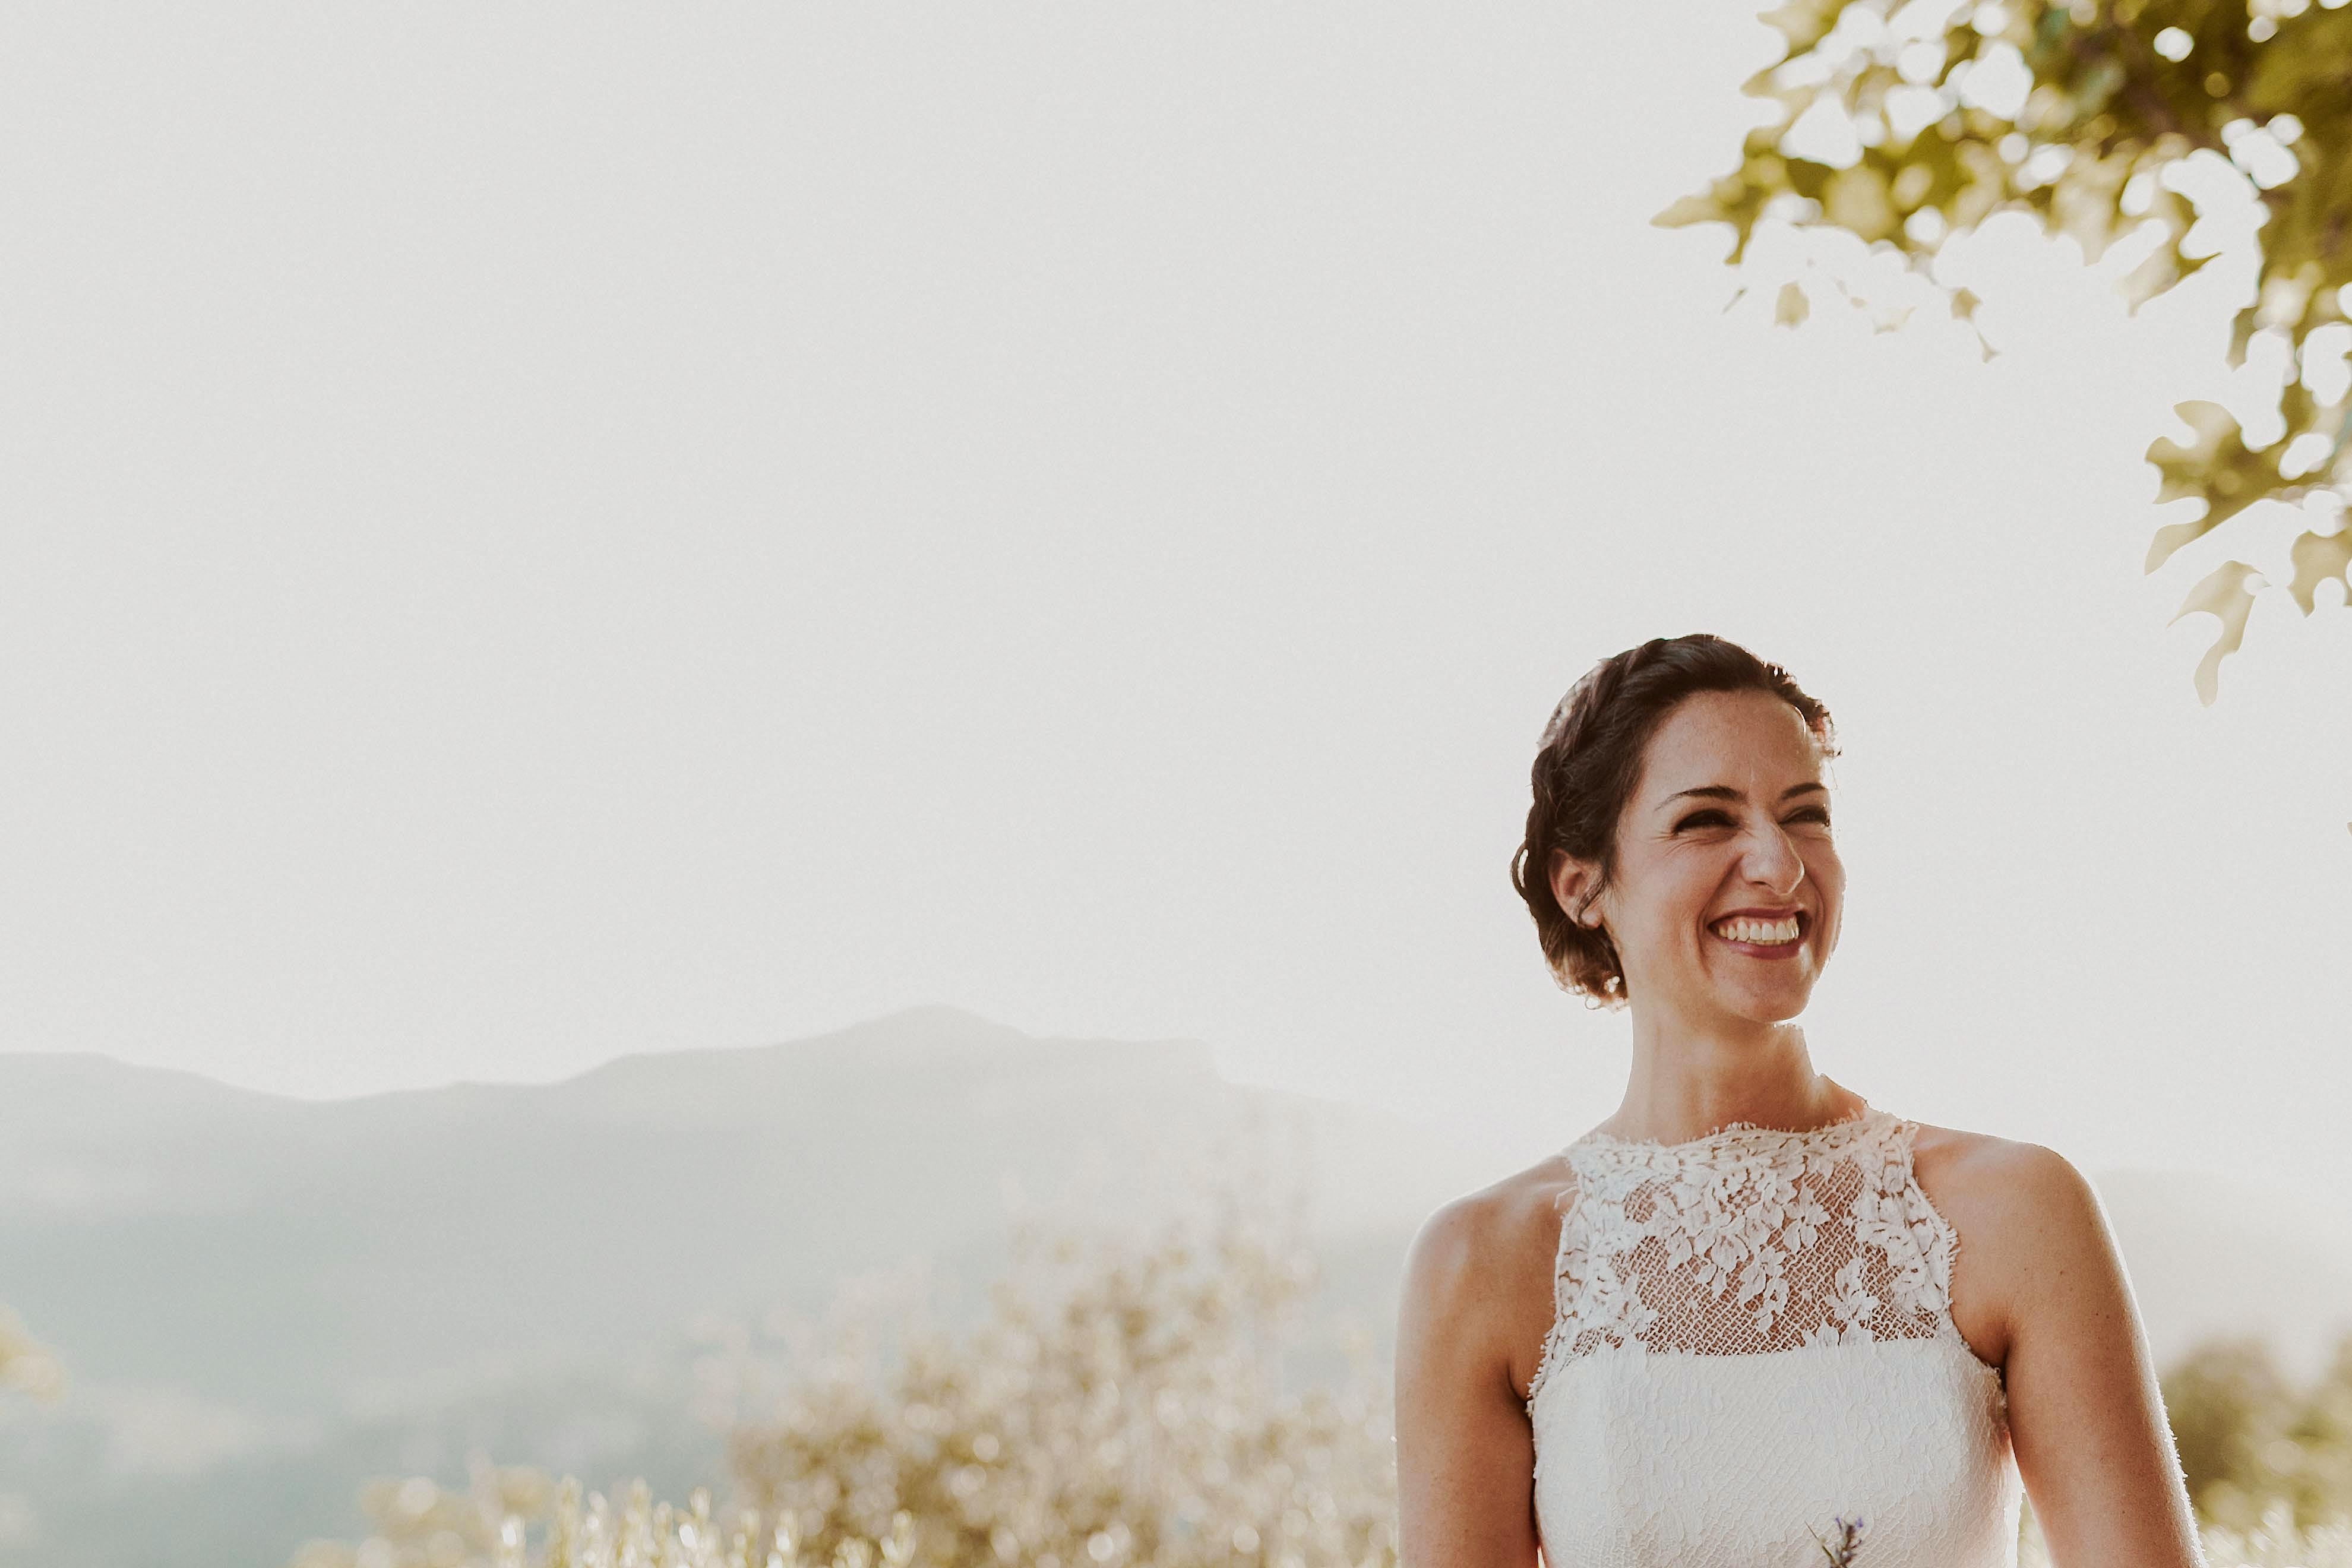 Boda rústica en la montaña. fotgrafo de bodas barcelona_056